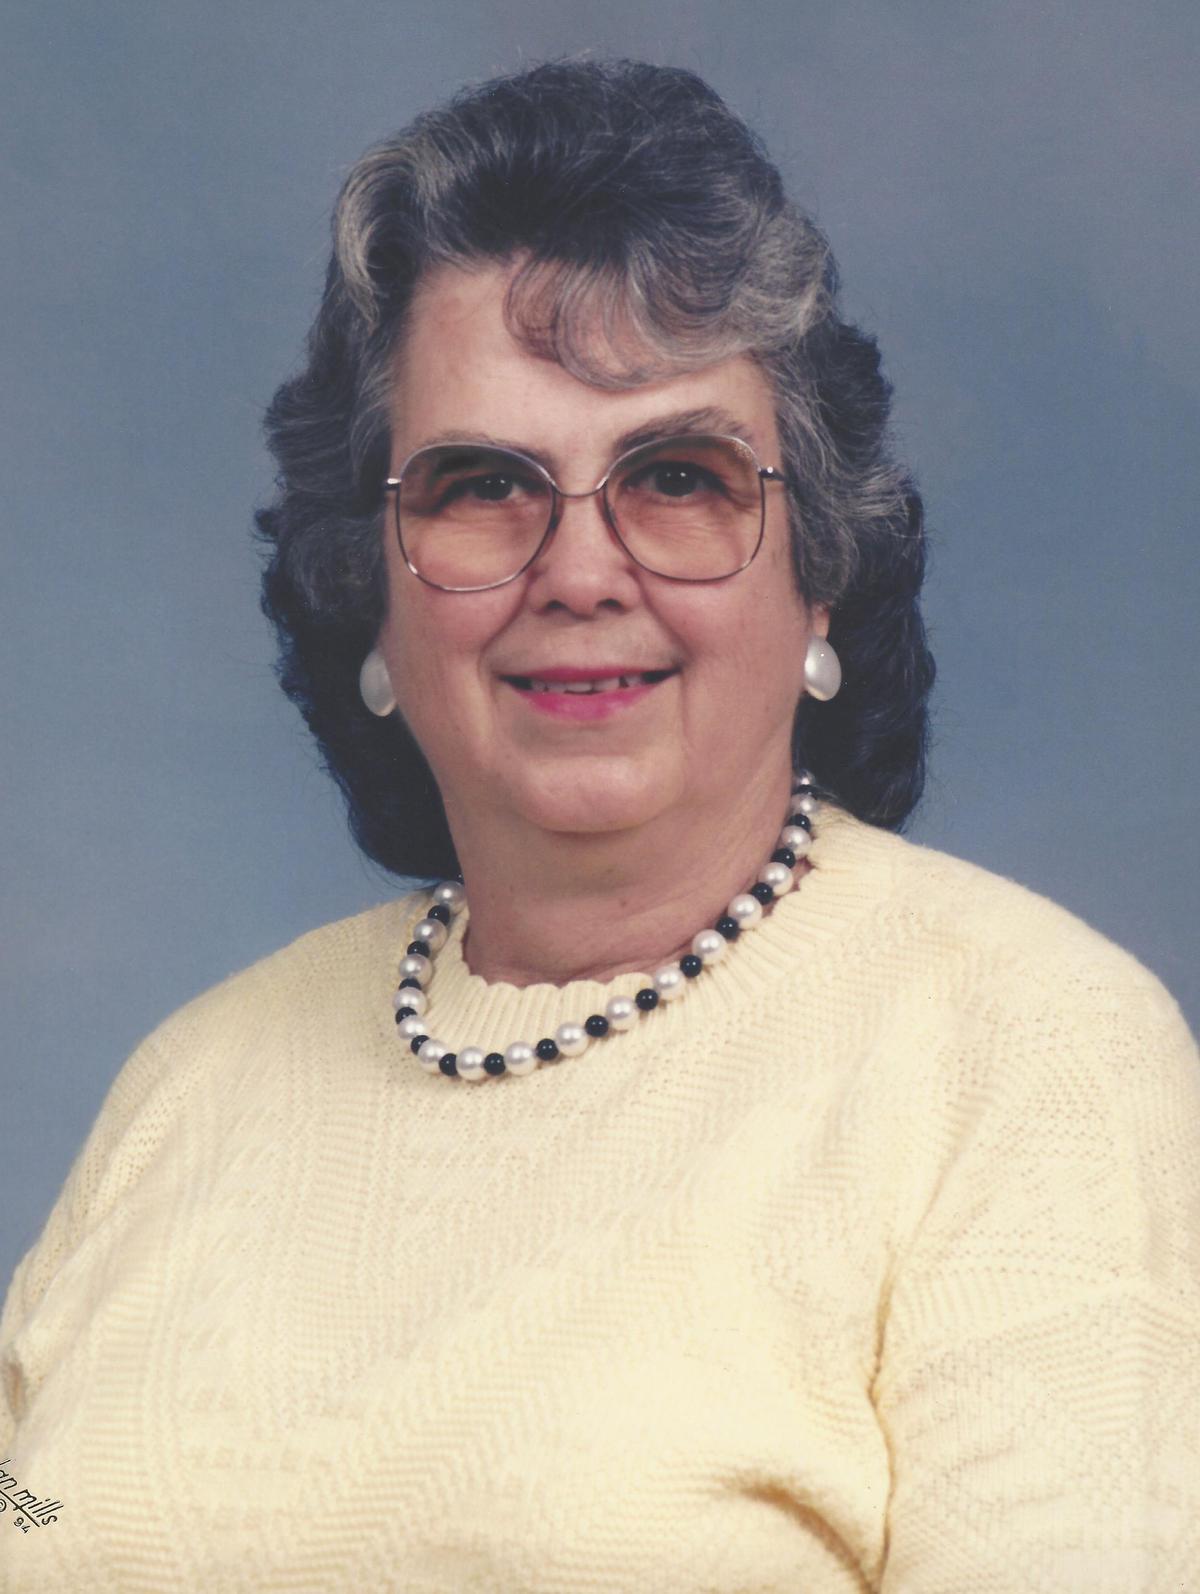 Zenna Hall Wallace